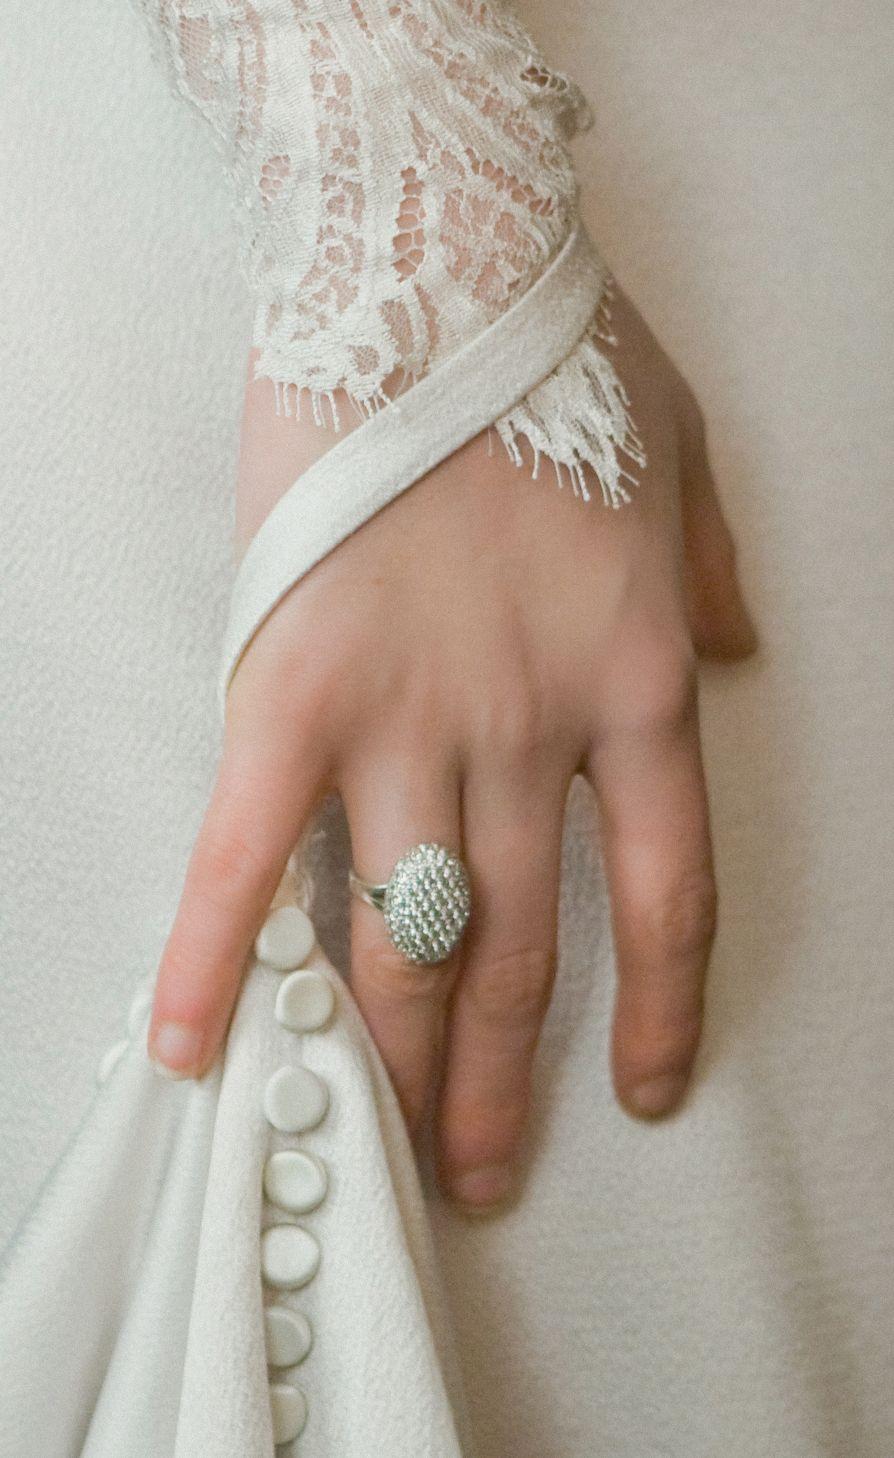 bella's wedding ring Bella Swan Wedding Ring The ring has divided twilight